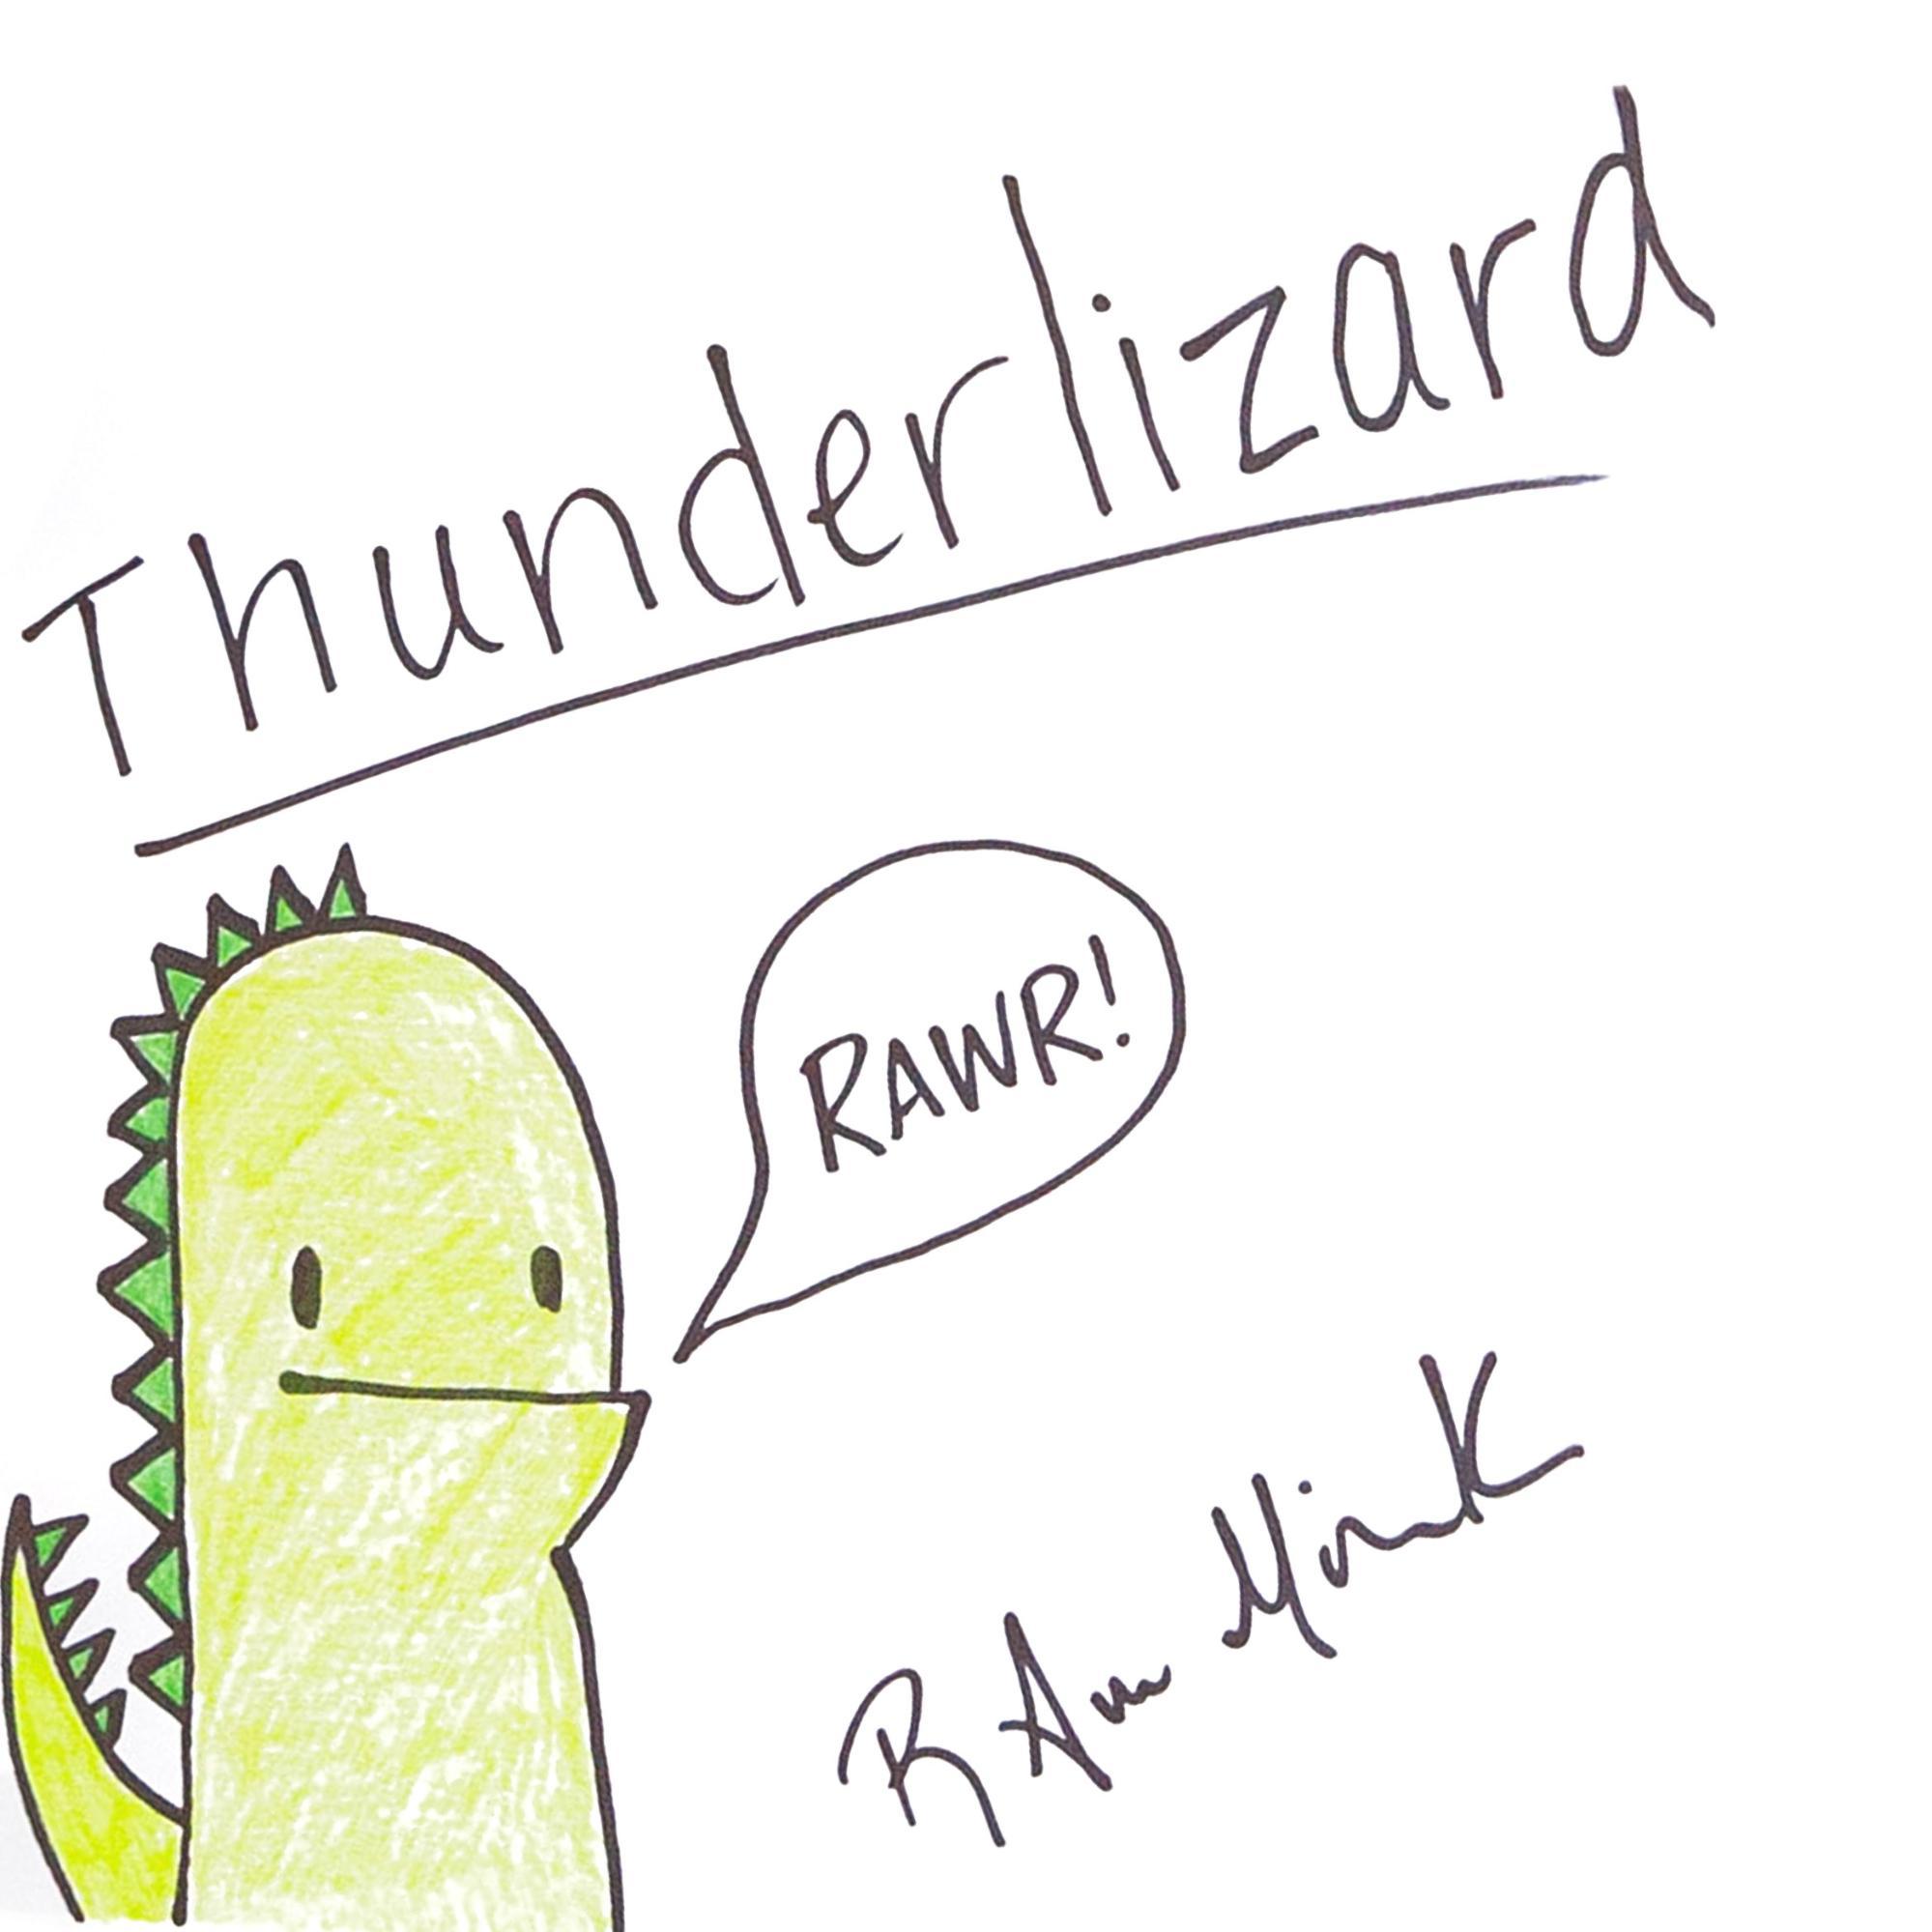 Thunderlizard. Anne Miura-Ko